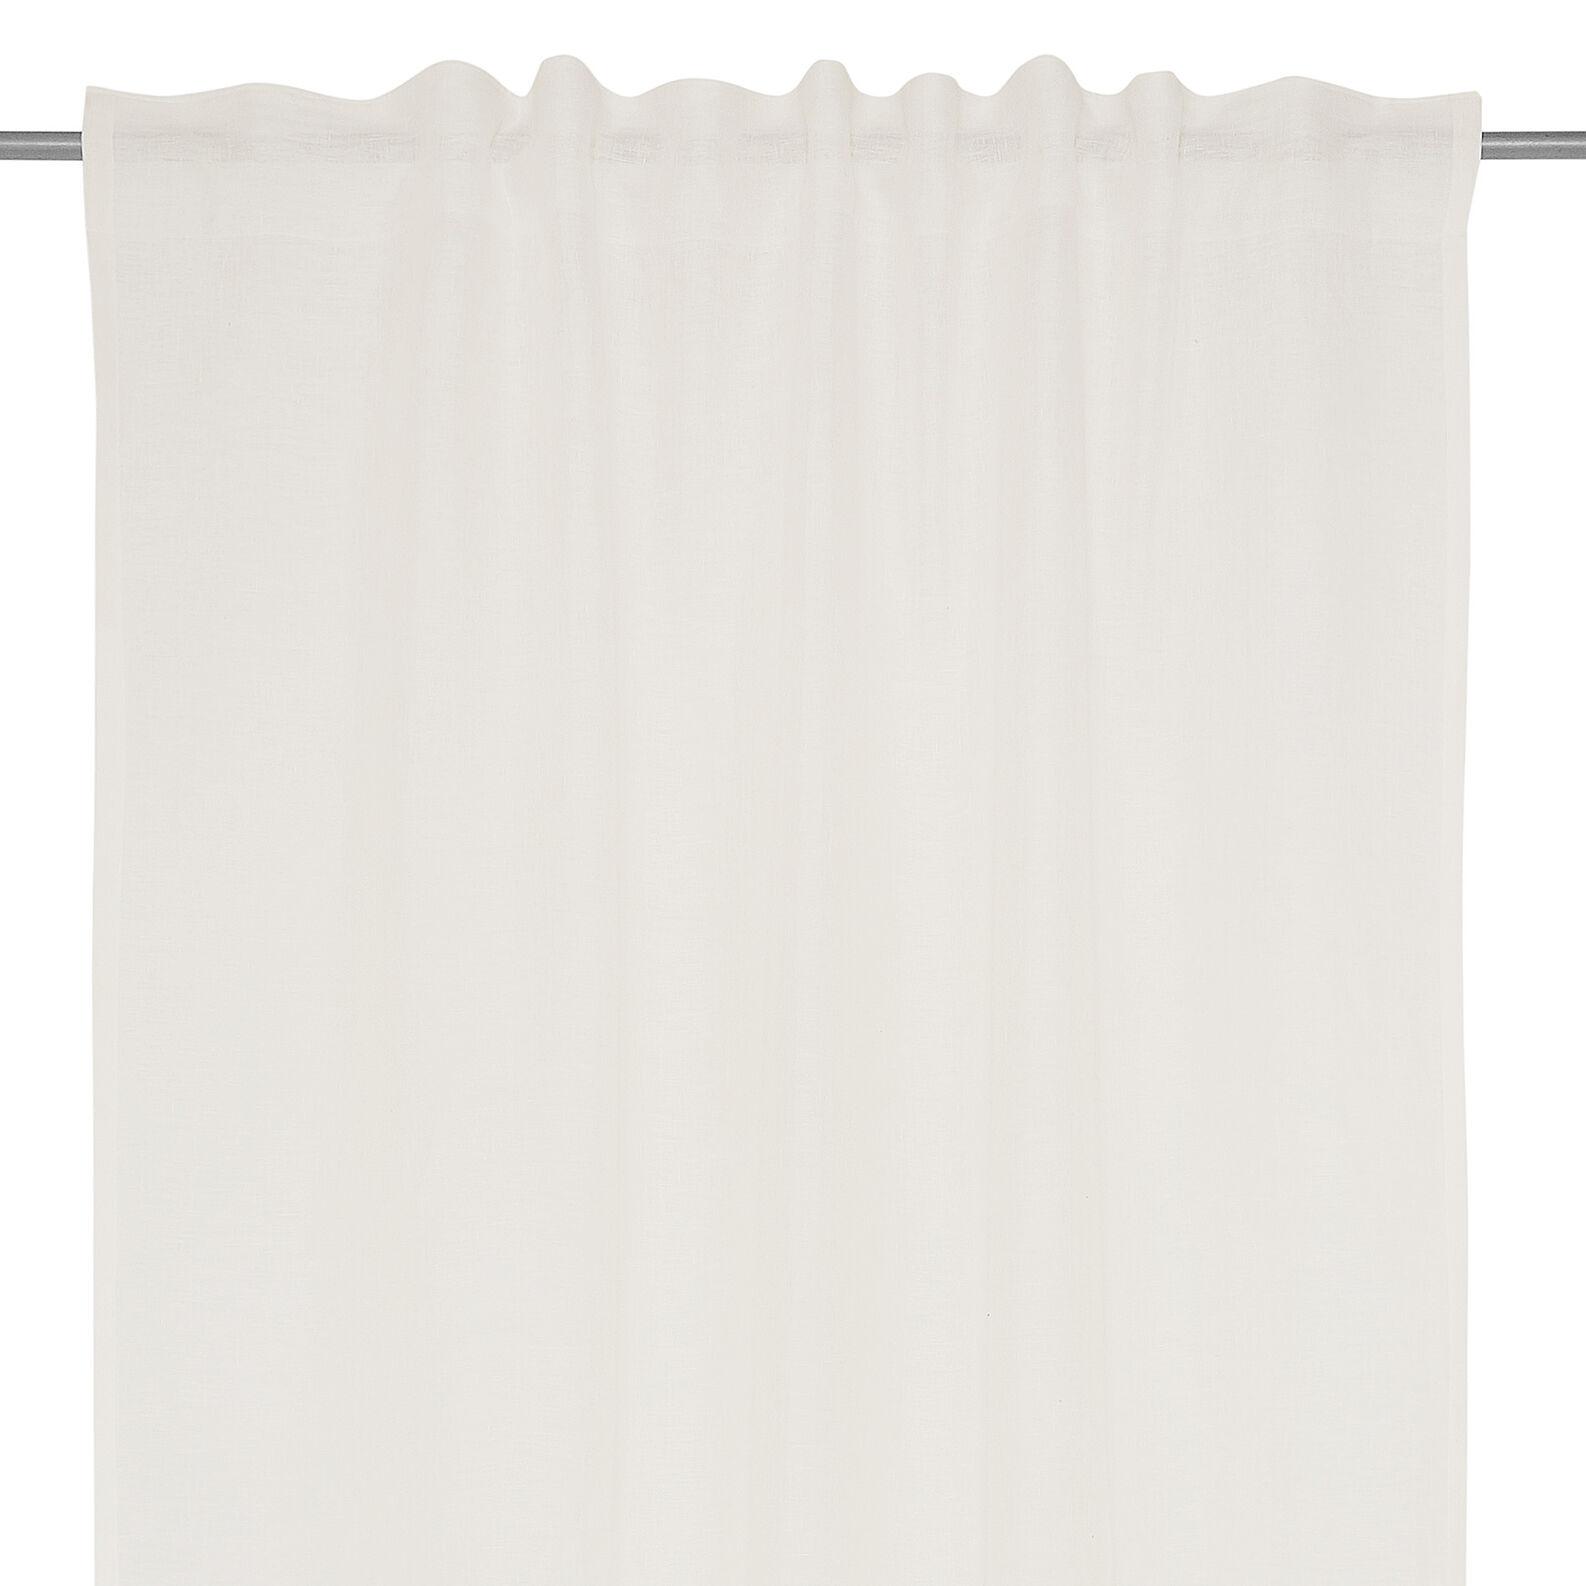 Solid colour 100% linen curtain